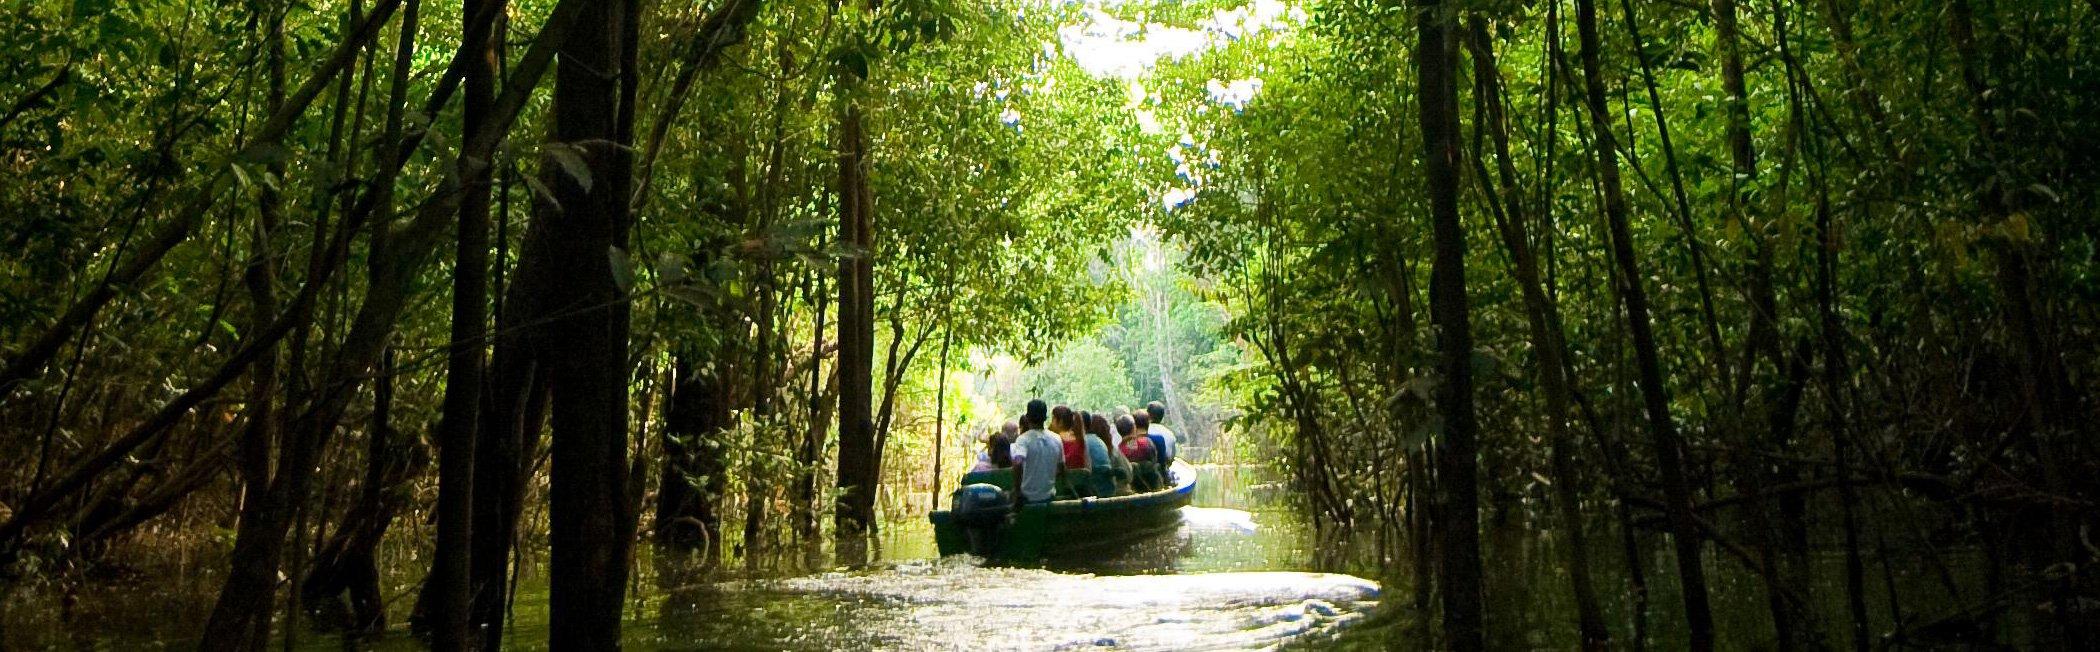 AMAZONIA-RIO-NEGRO